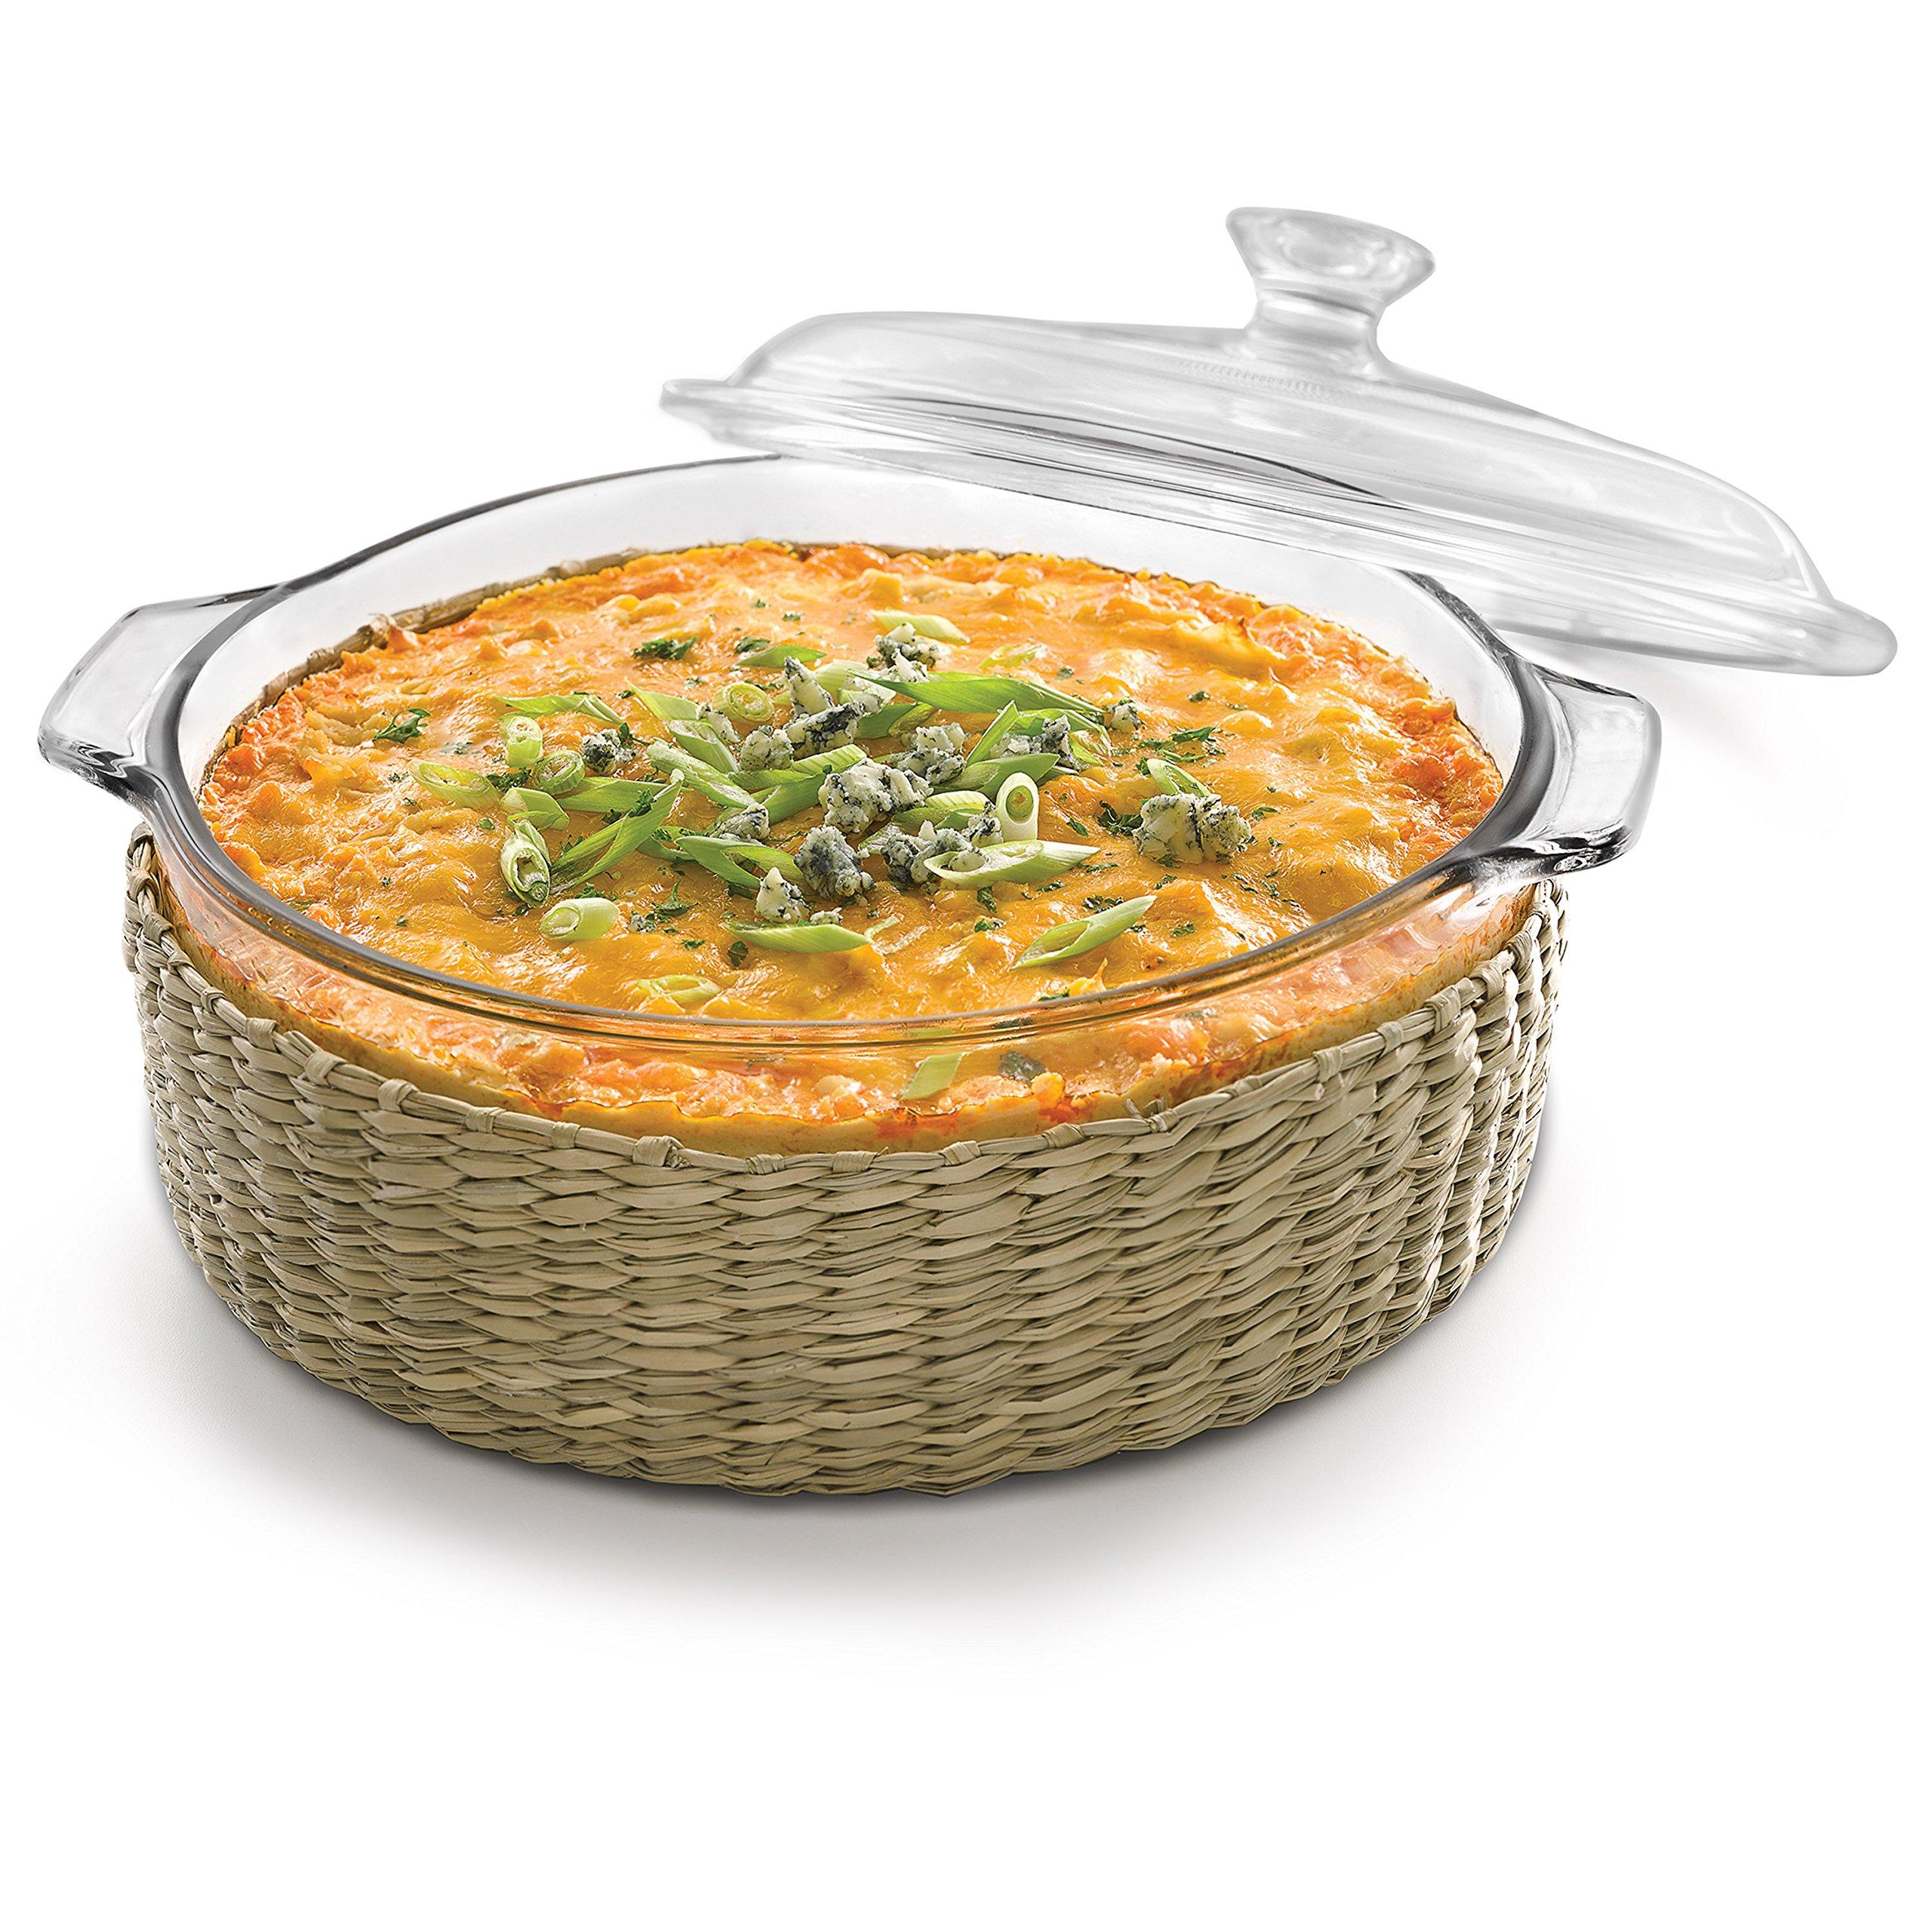 Libbey Baker's Basics 2 quart Glass Casserole with Basket